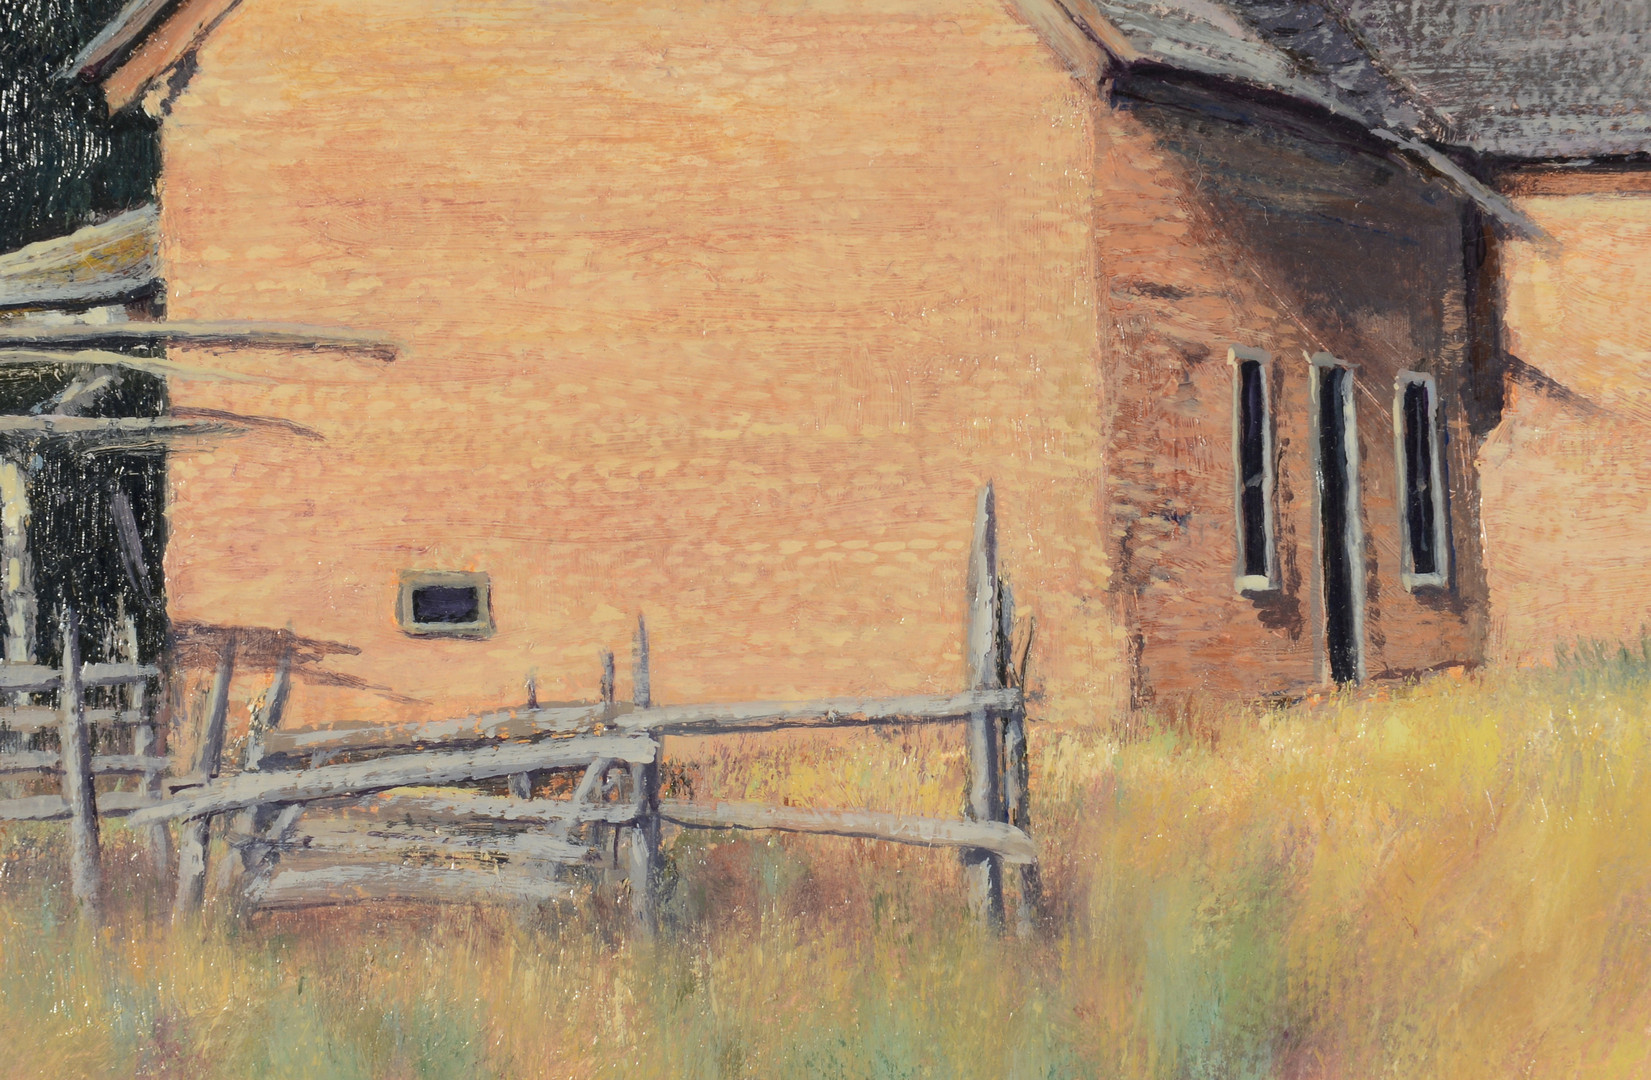 Lot 436: Travis Humphreys Landscape with cabin